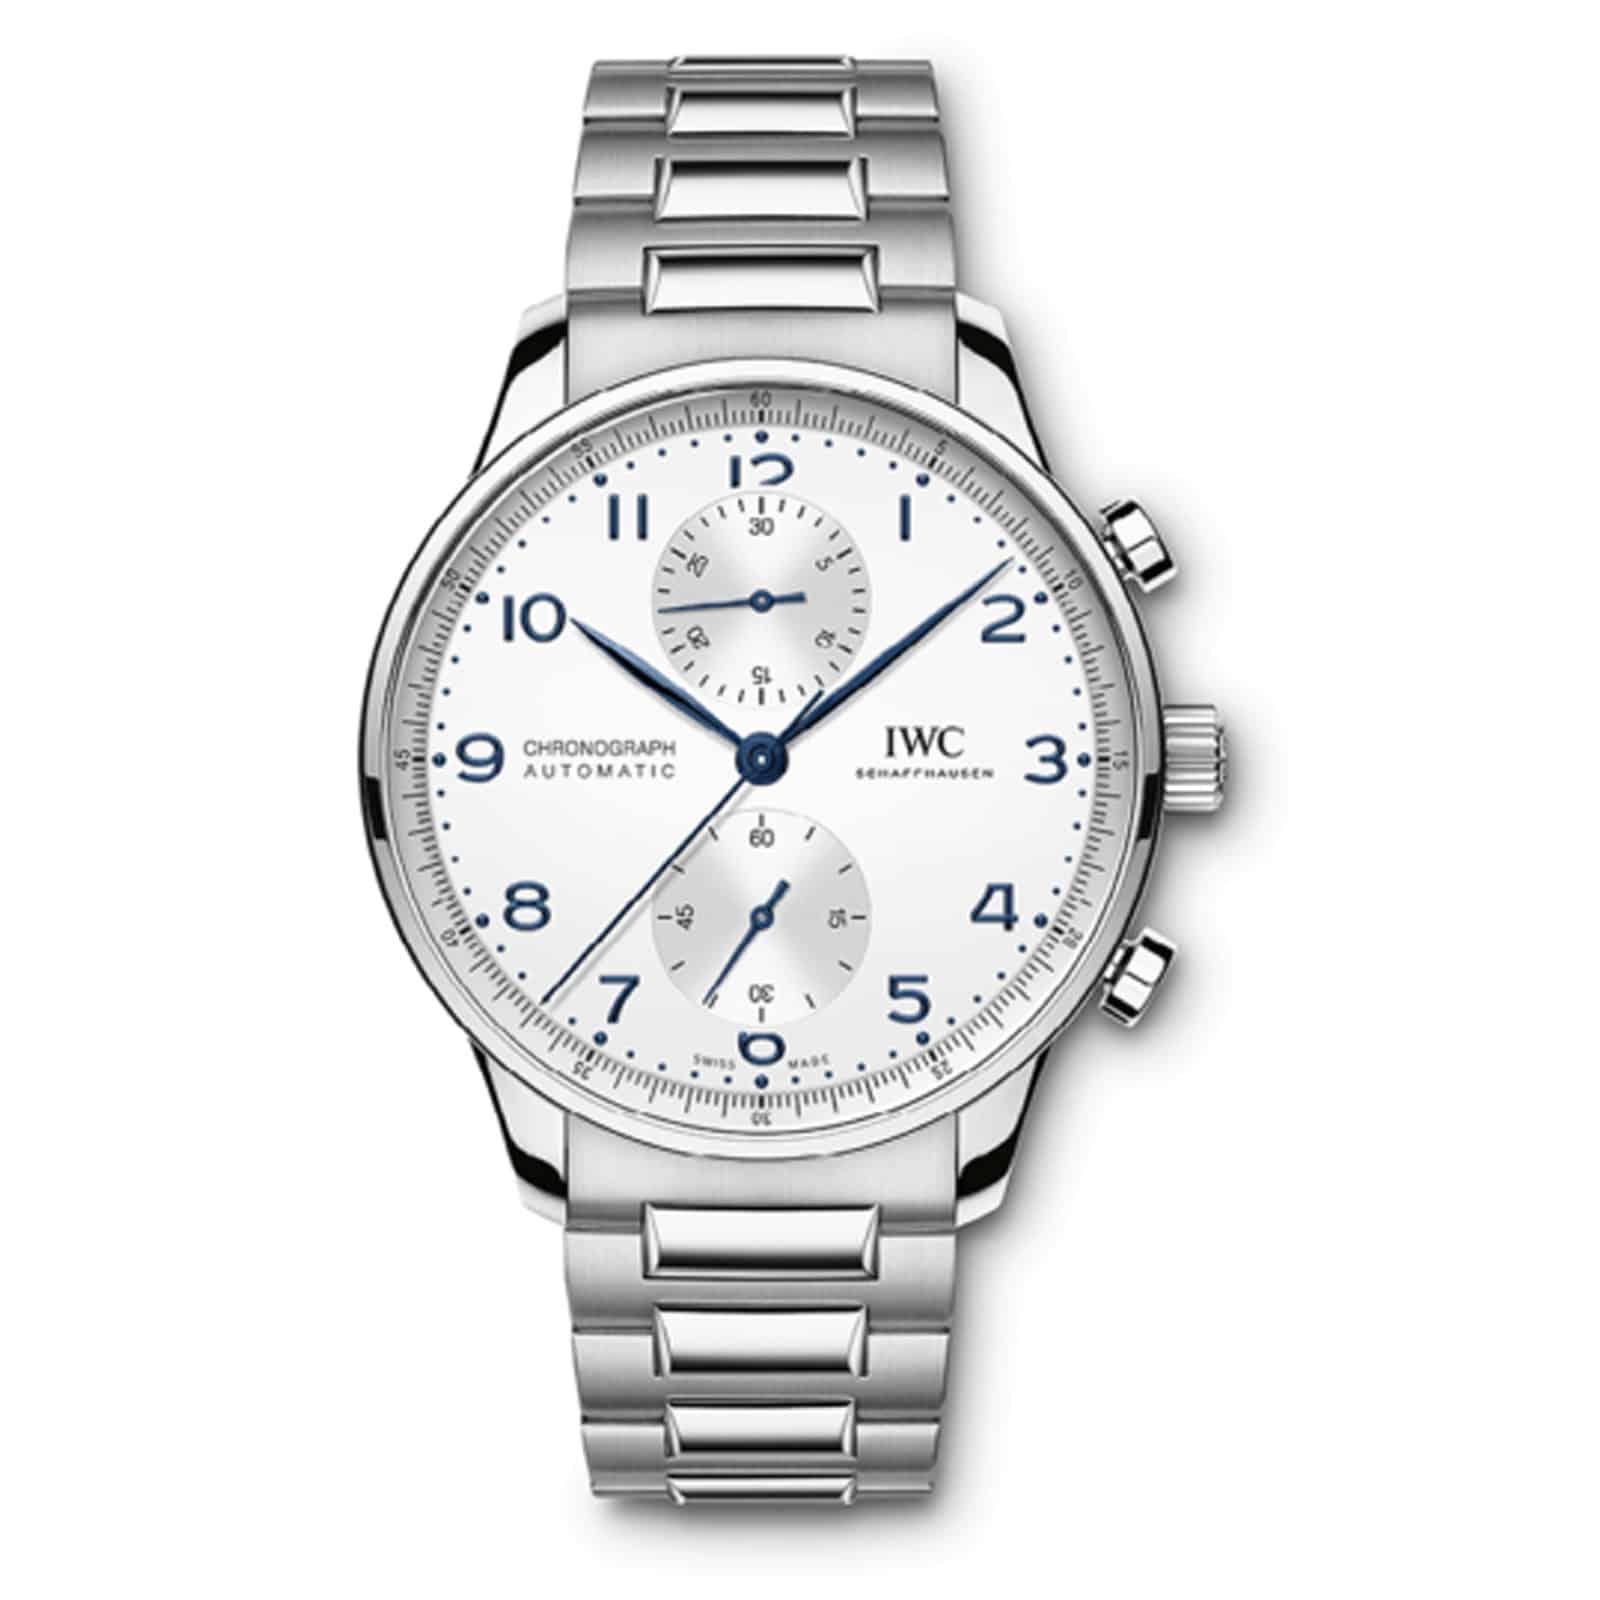 Montre-IWC-Portugieser-IW371617-Lionel-Meylan-horlogerie-joaillerie-vevey.jpg